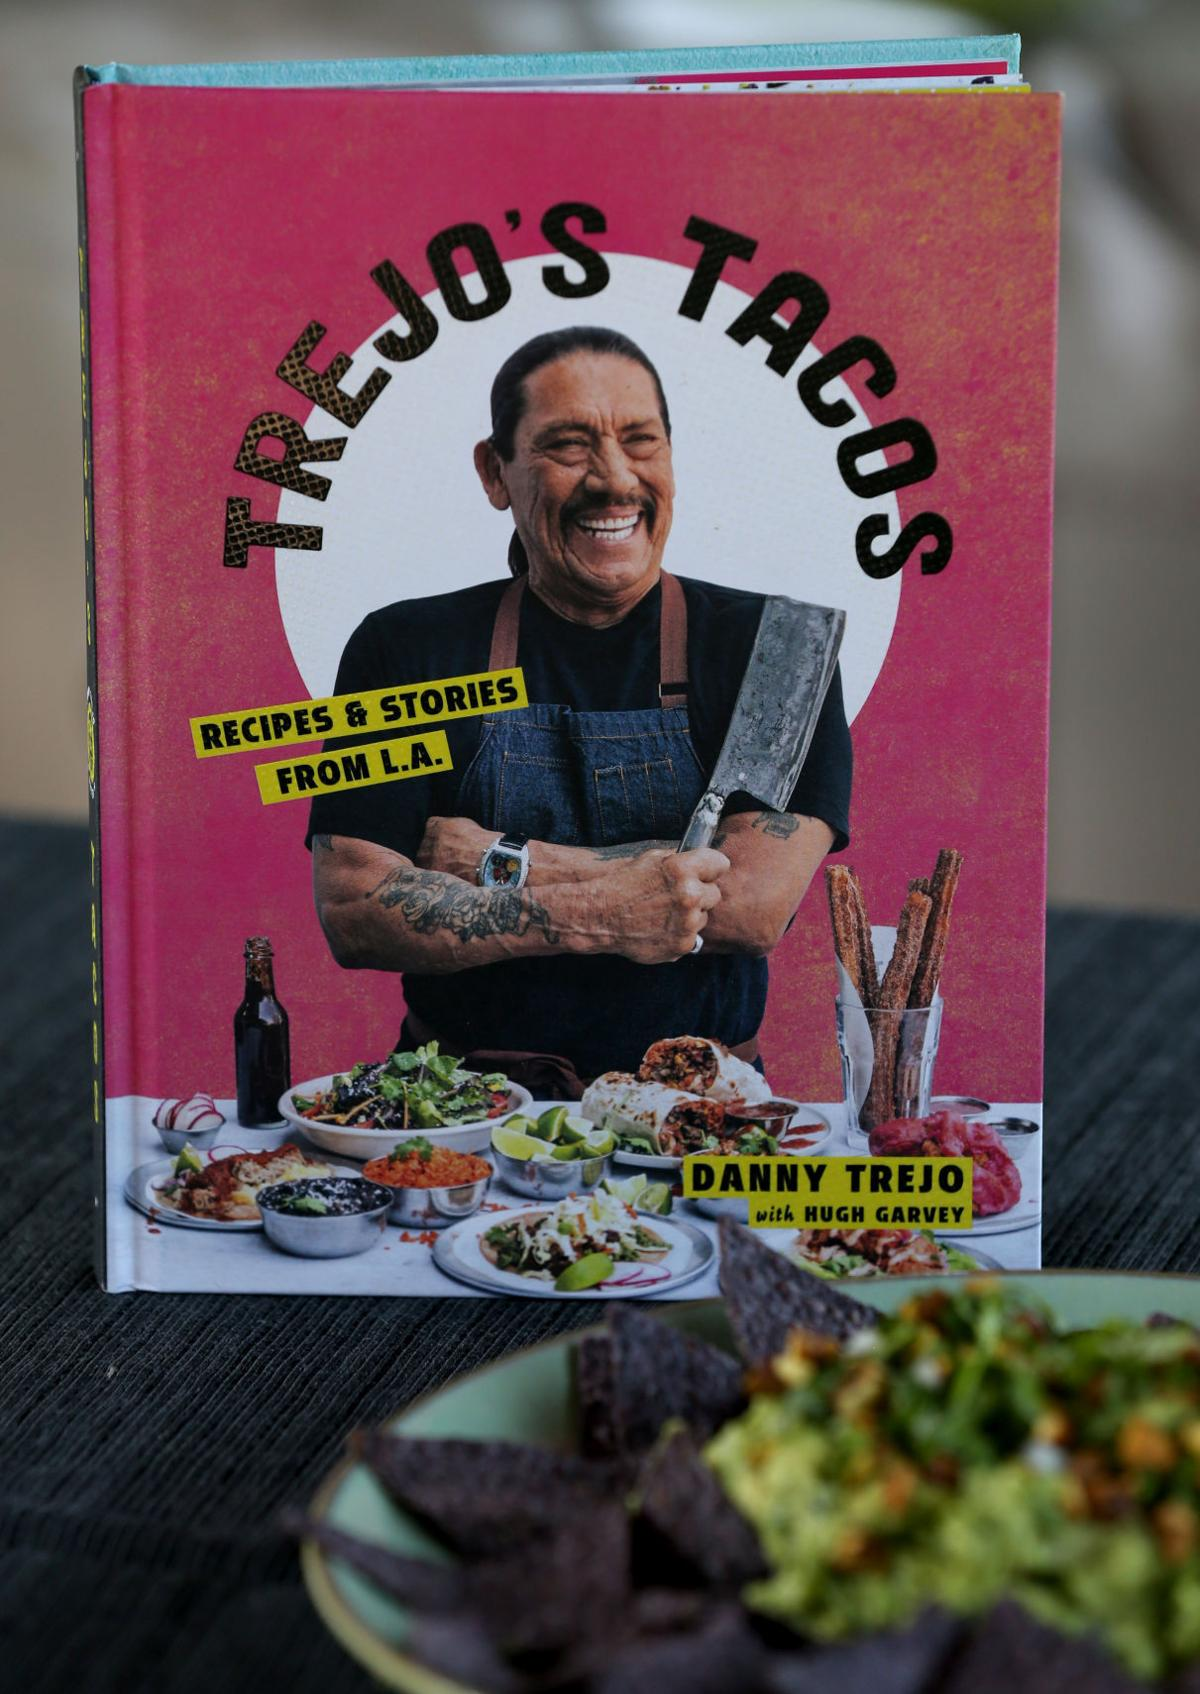 Actor Danny Trejo's new cookbook